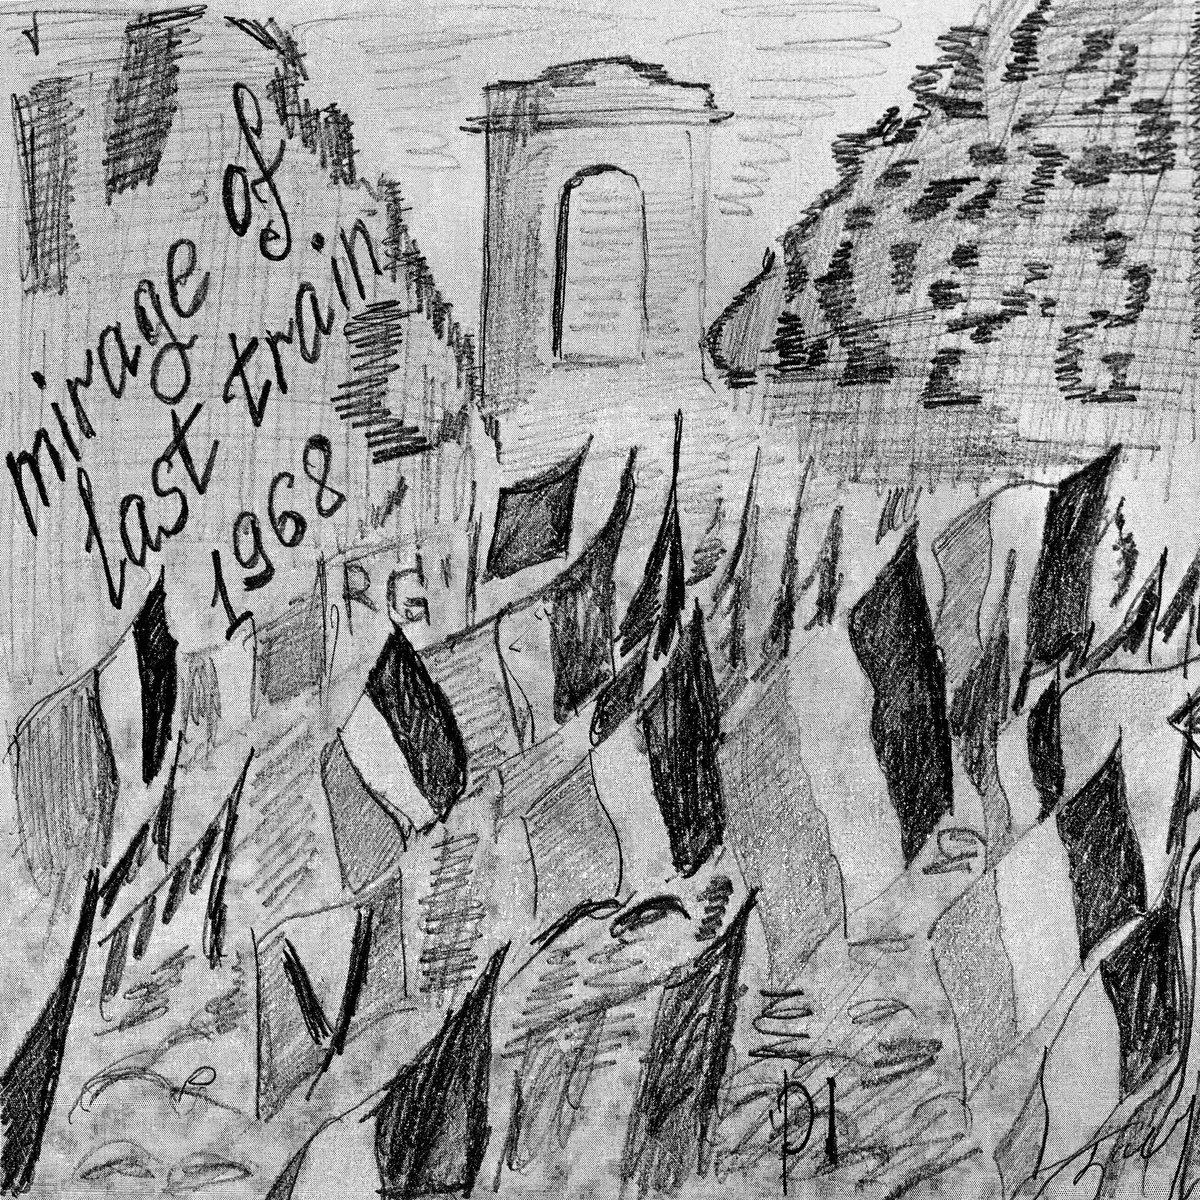 mirage of last train - 1968 (2016)